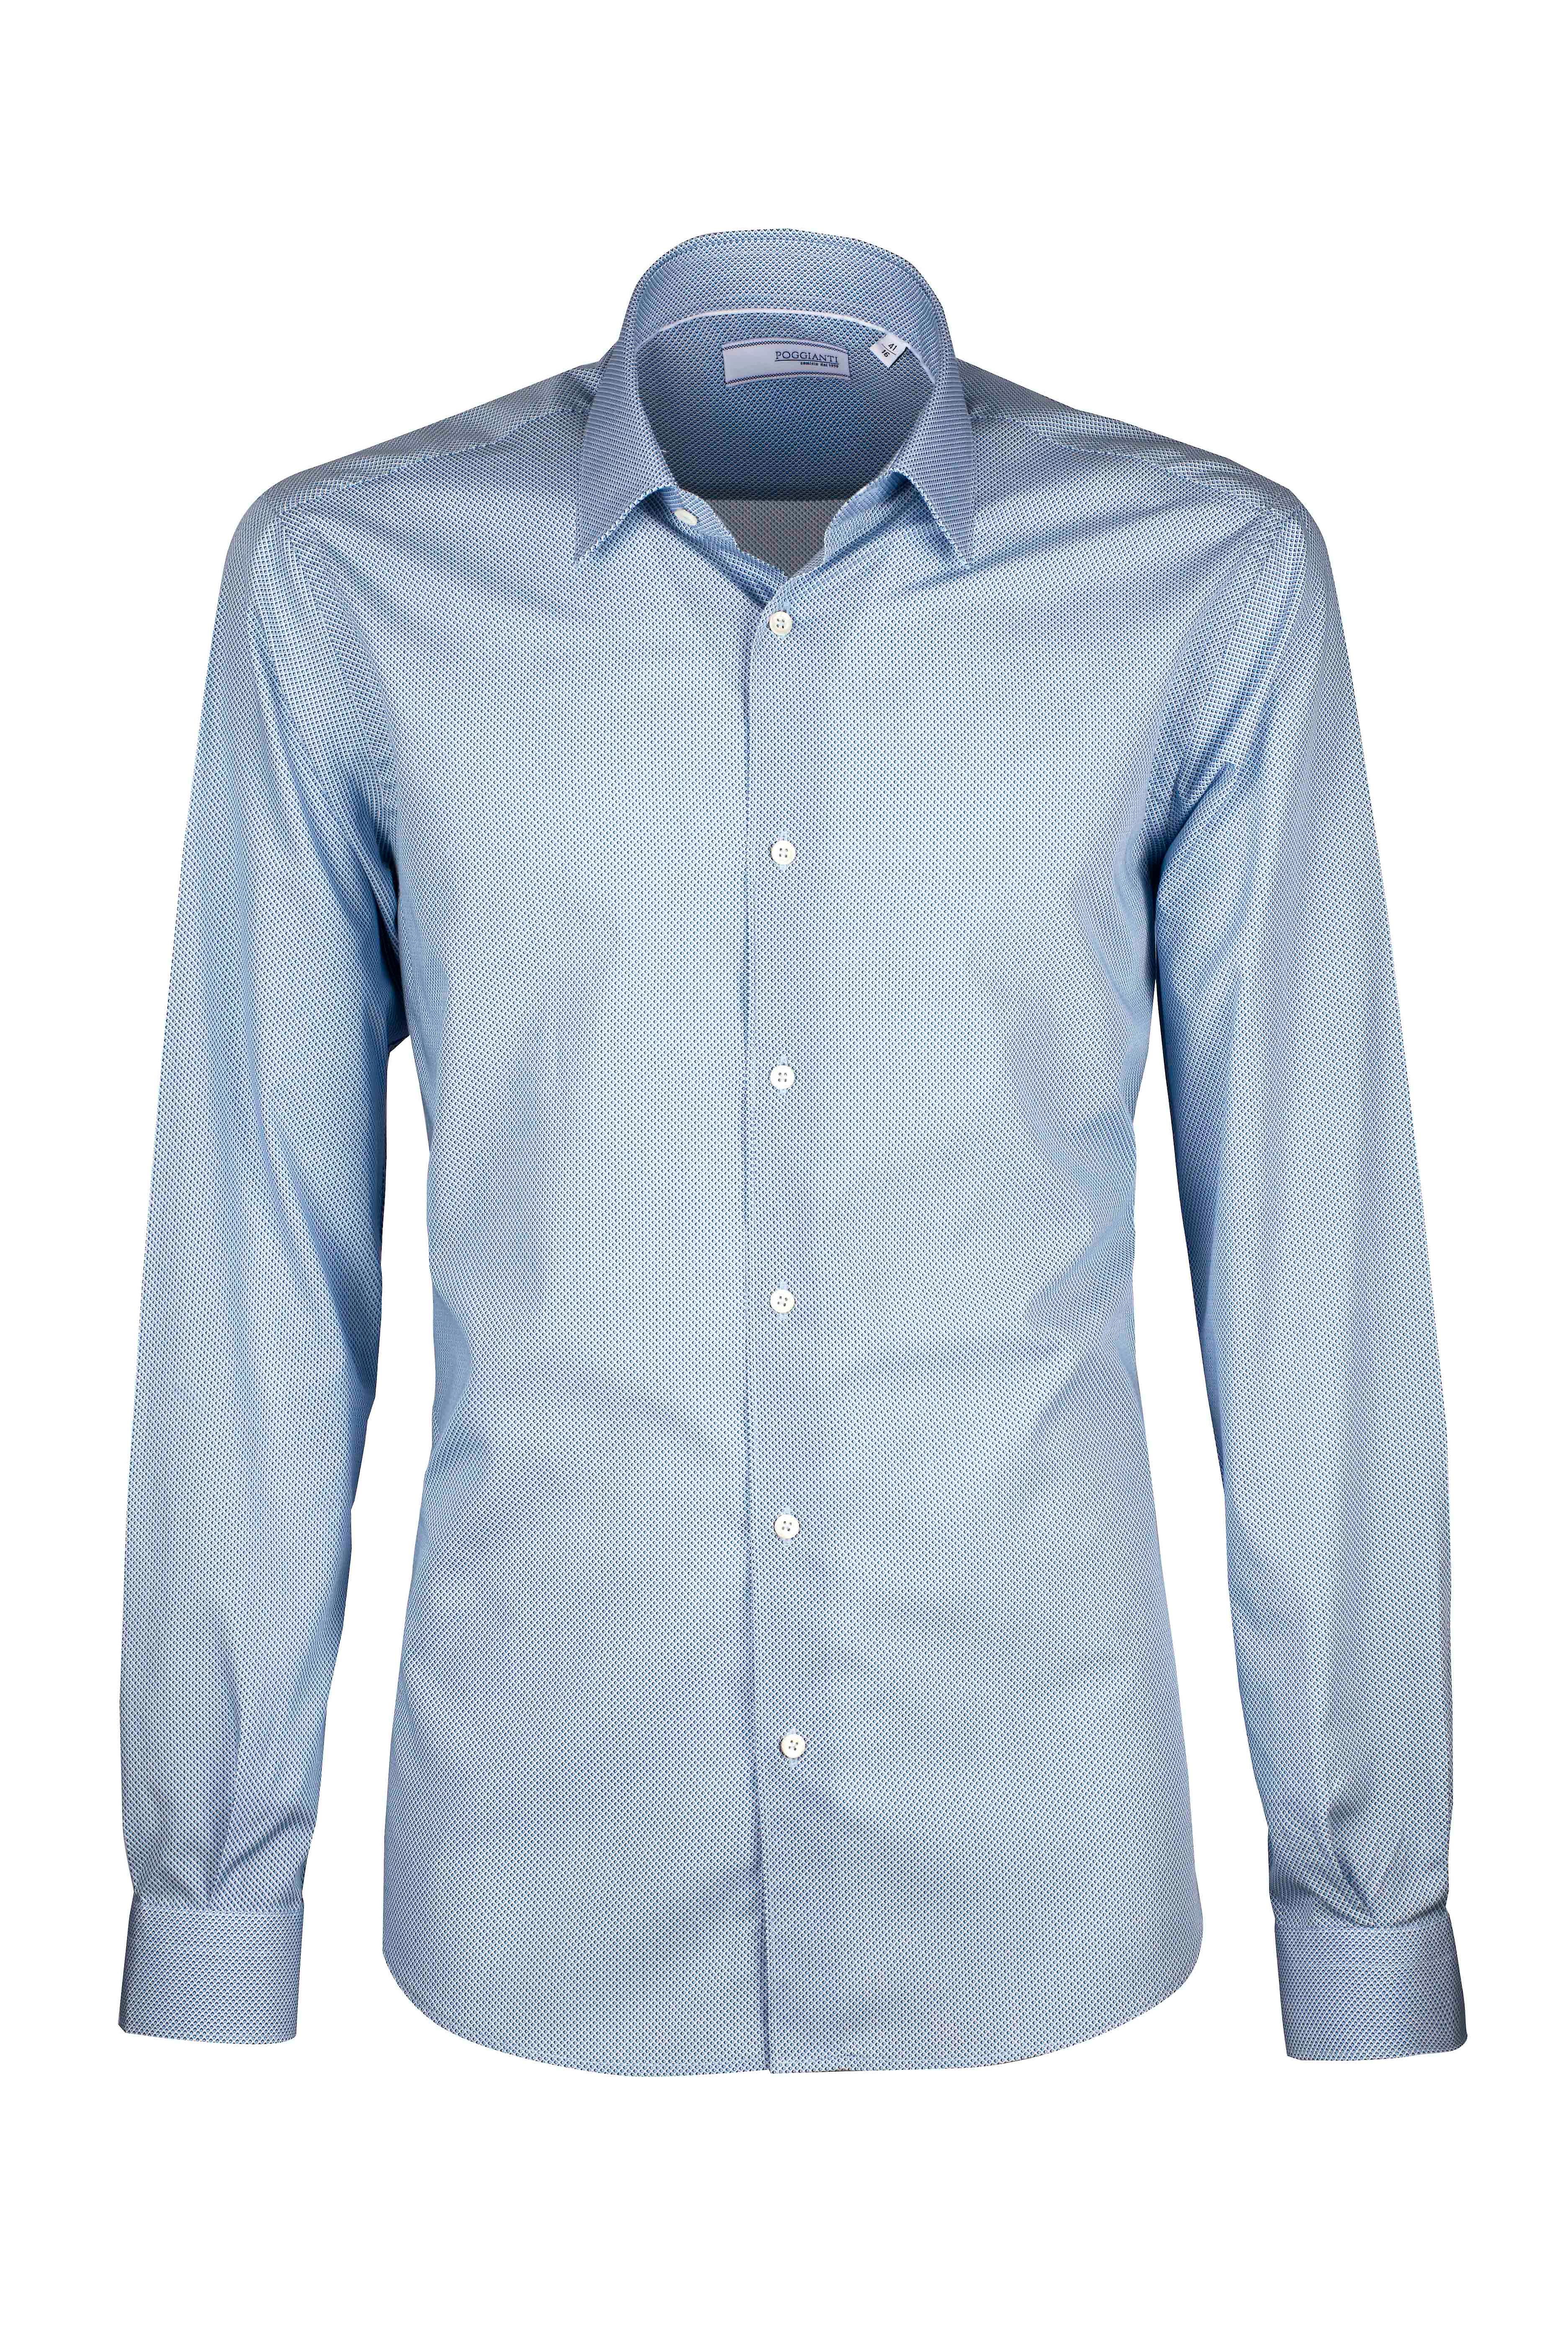 Fabio Giovanni Carabella Shirt - Geometric Print - High Quality Italian Casual Shirt